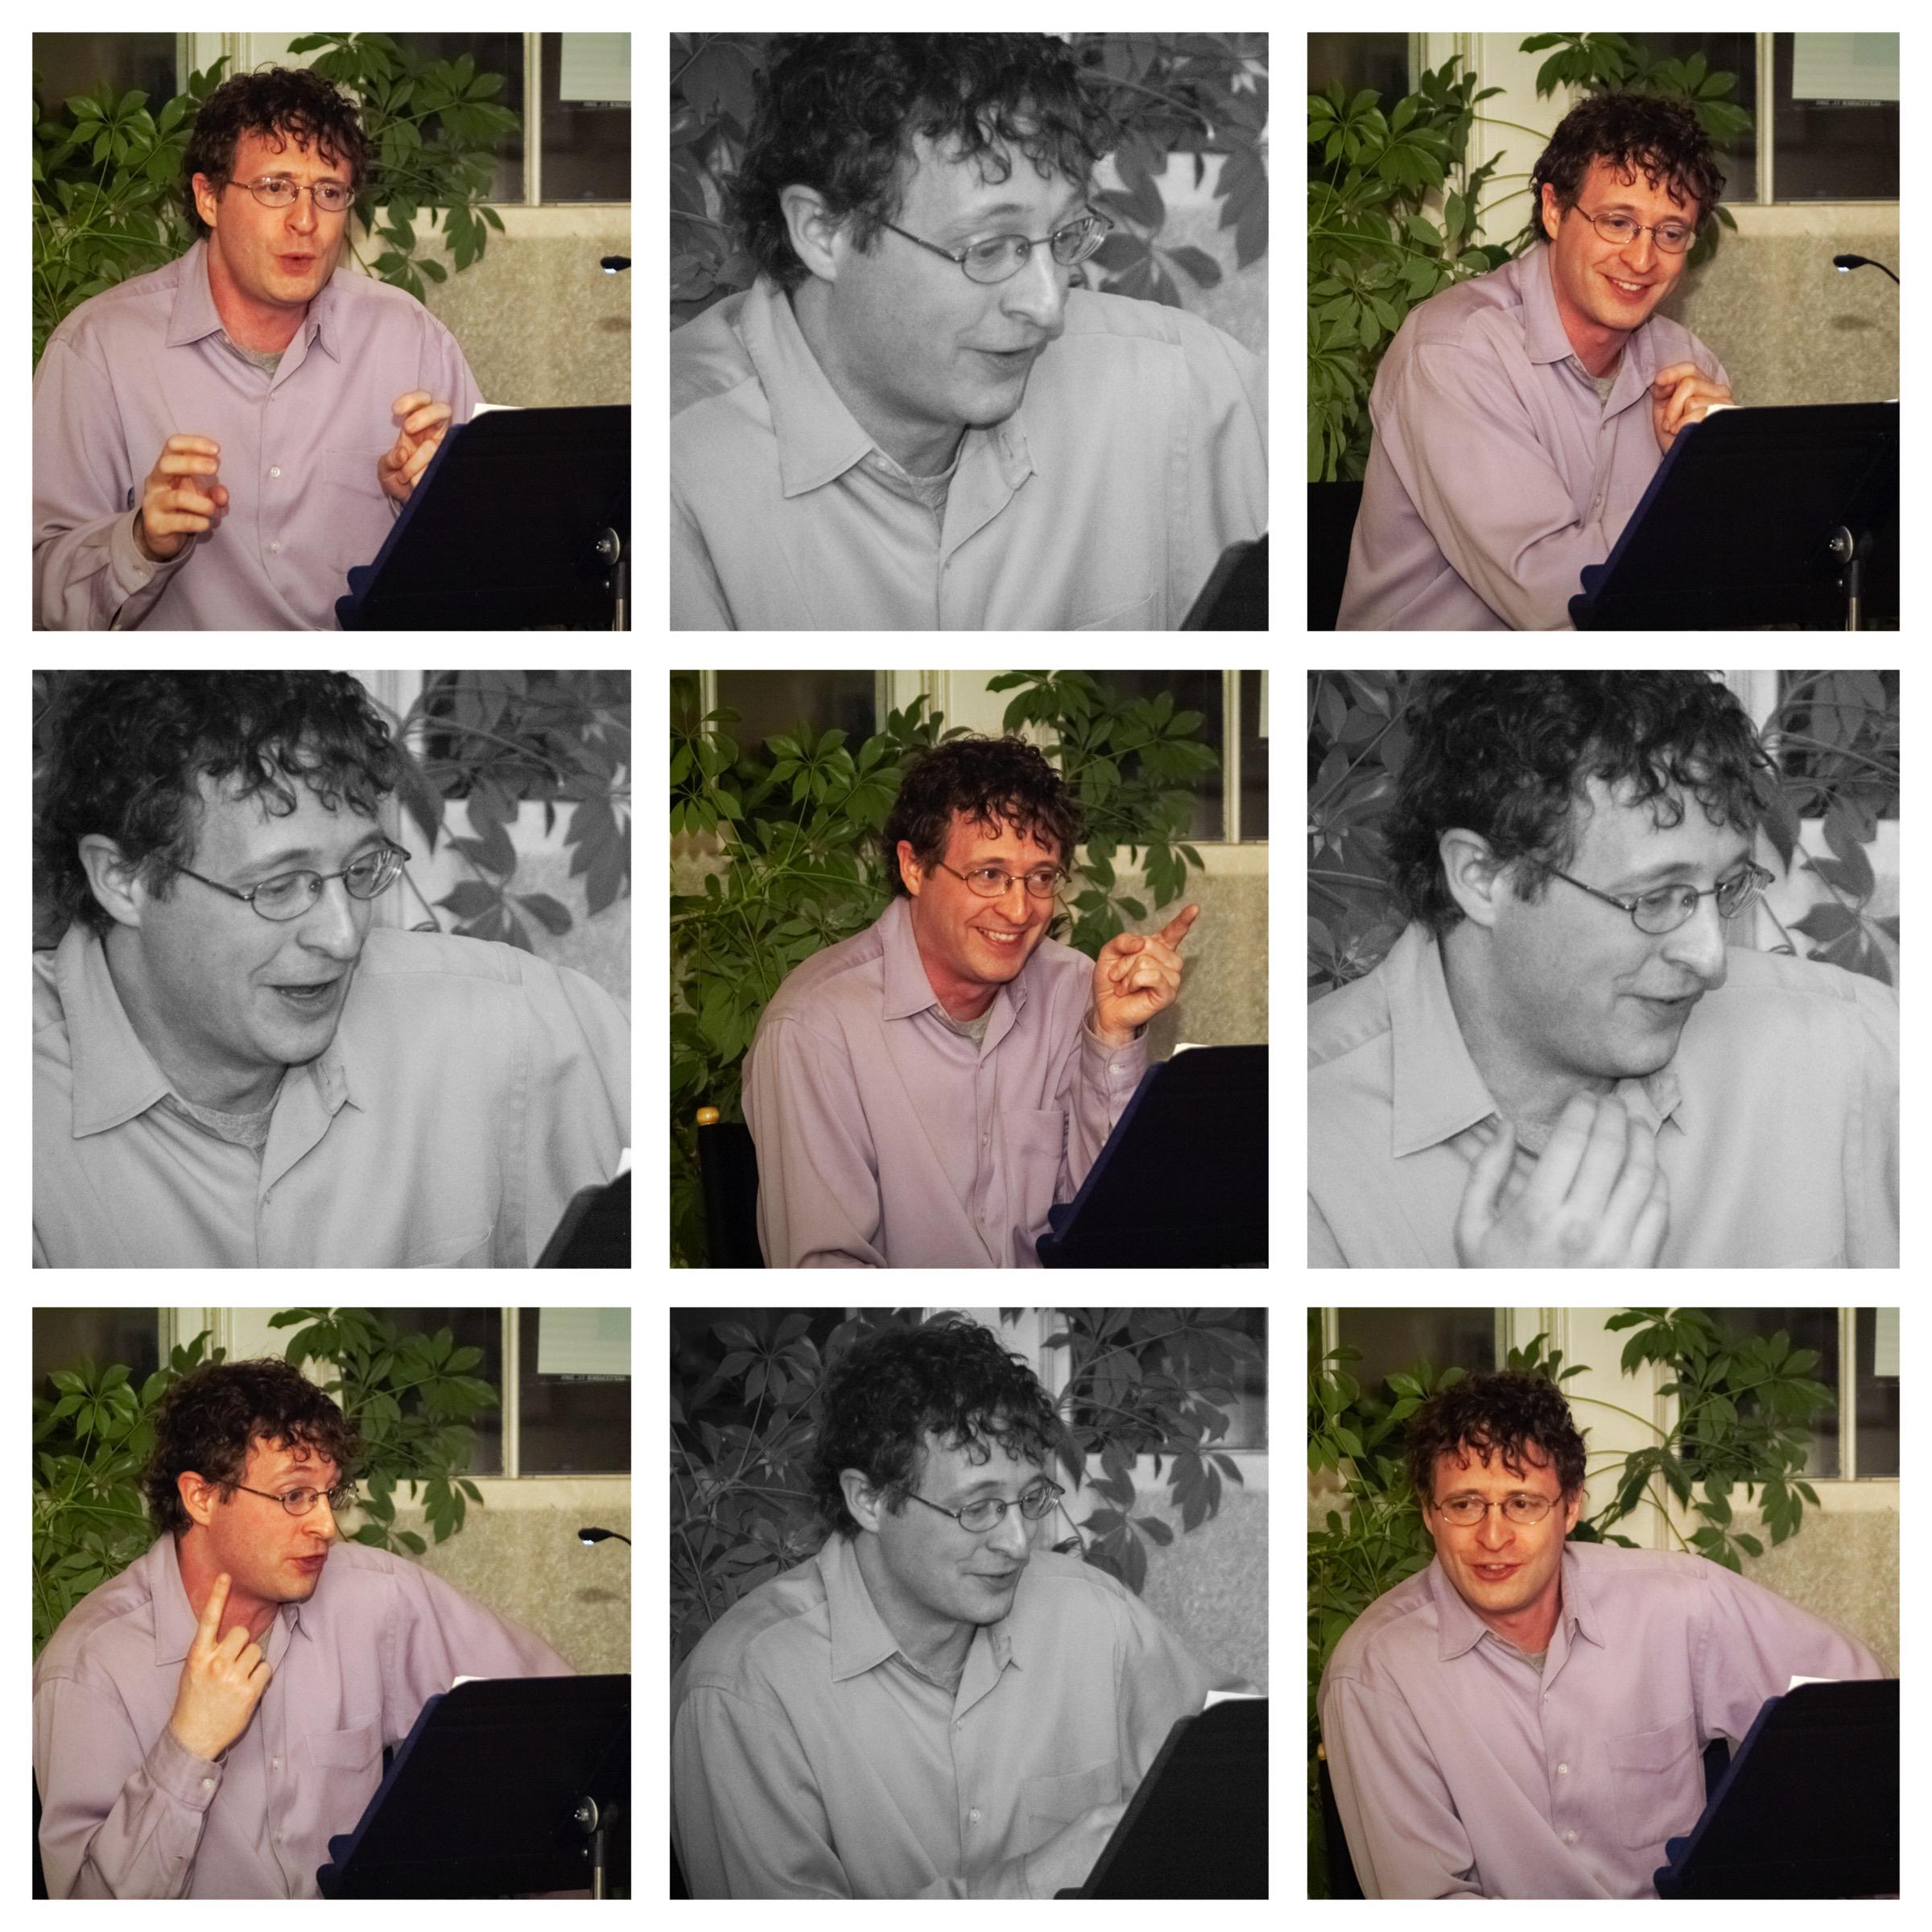 Birnholz Mashup_2009.JPG